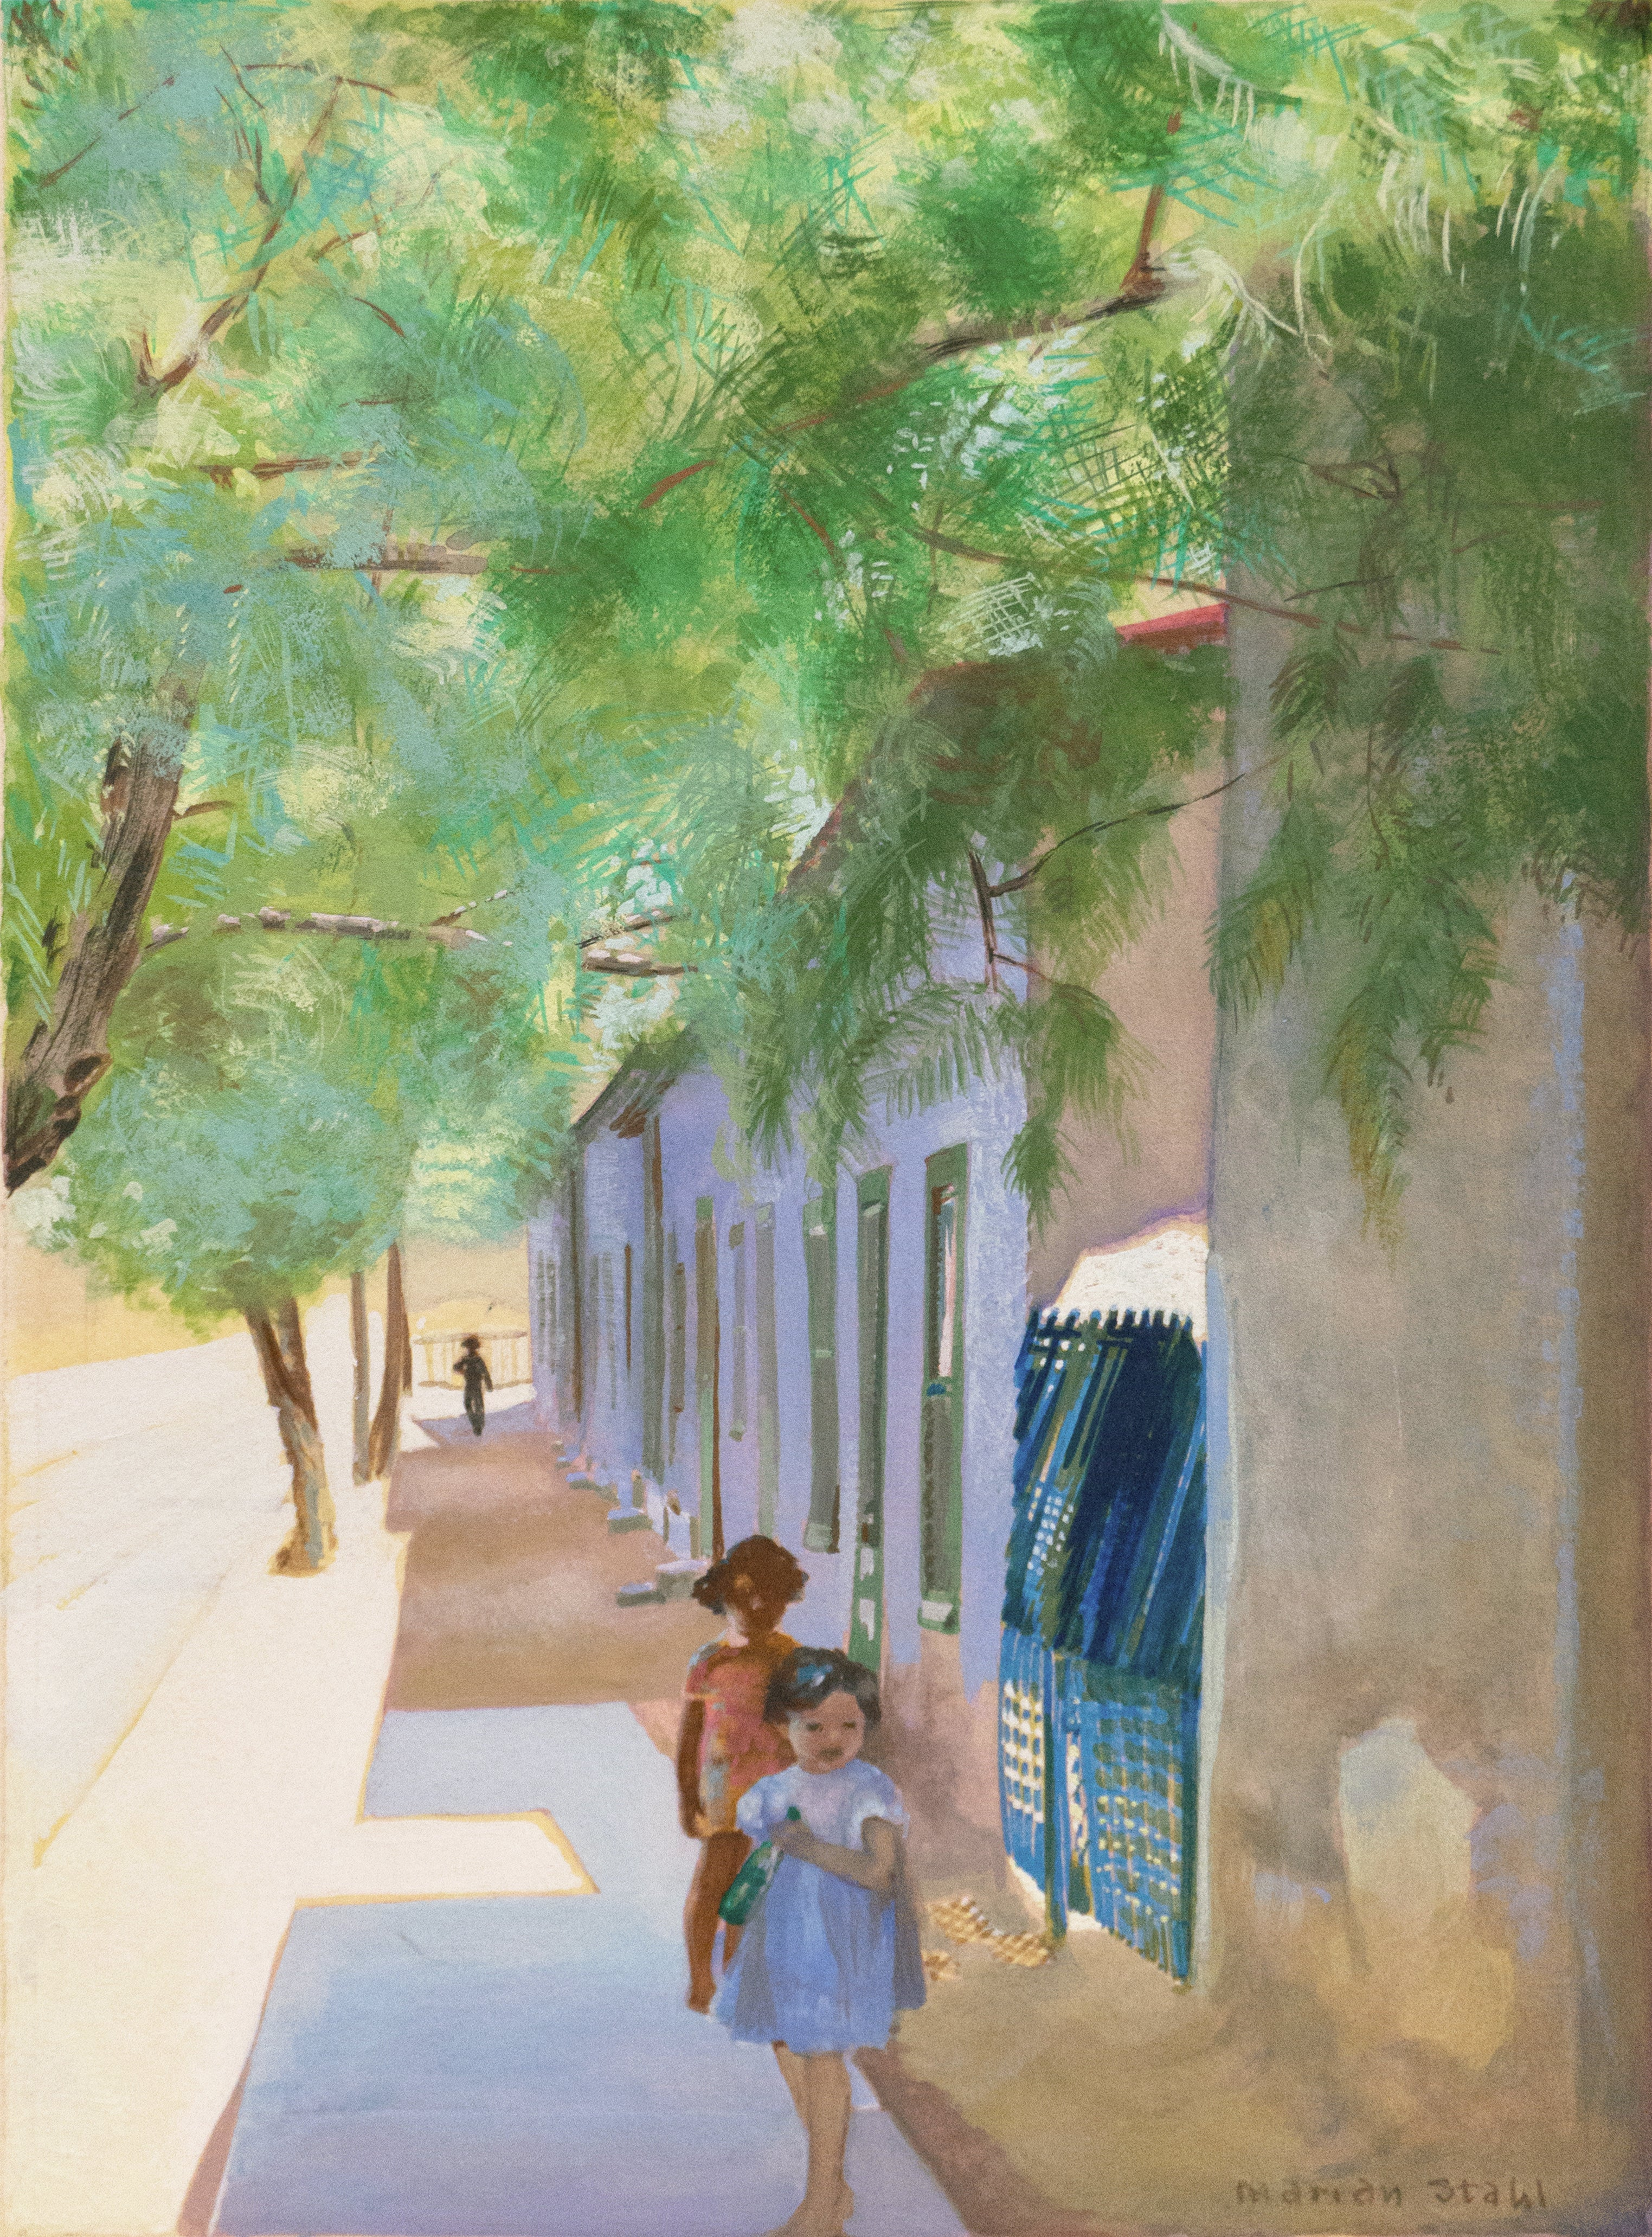 'In the Shade of La Casa Cordova, Tucson', Meyer Street, Arizona